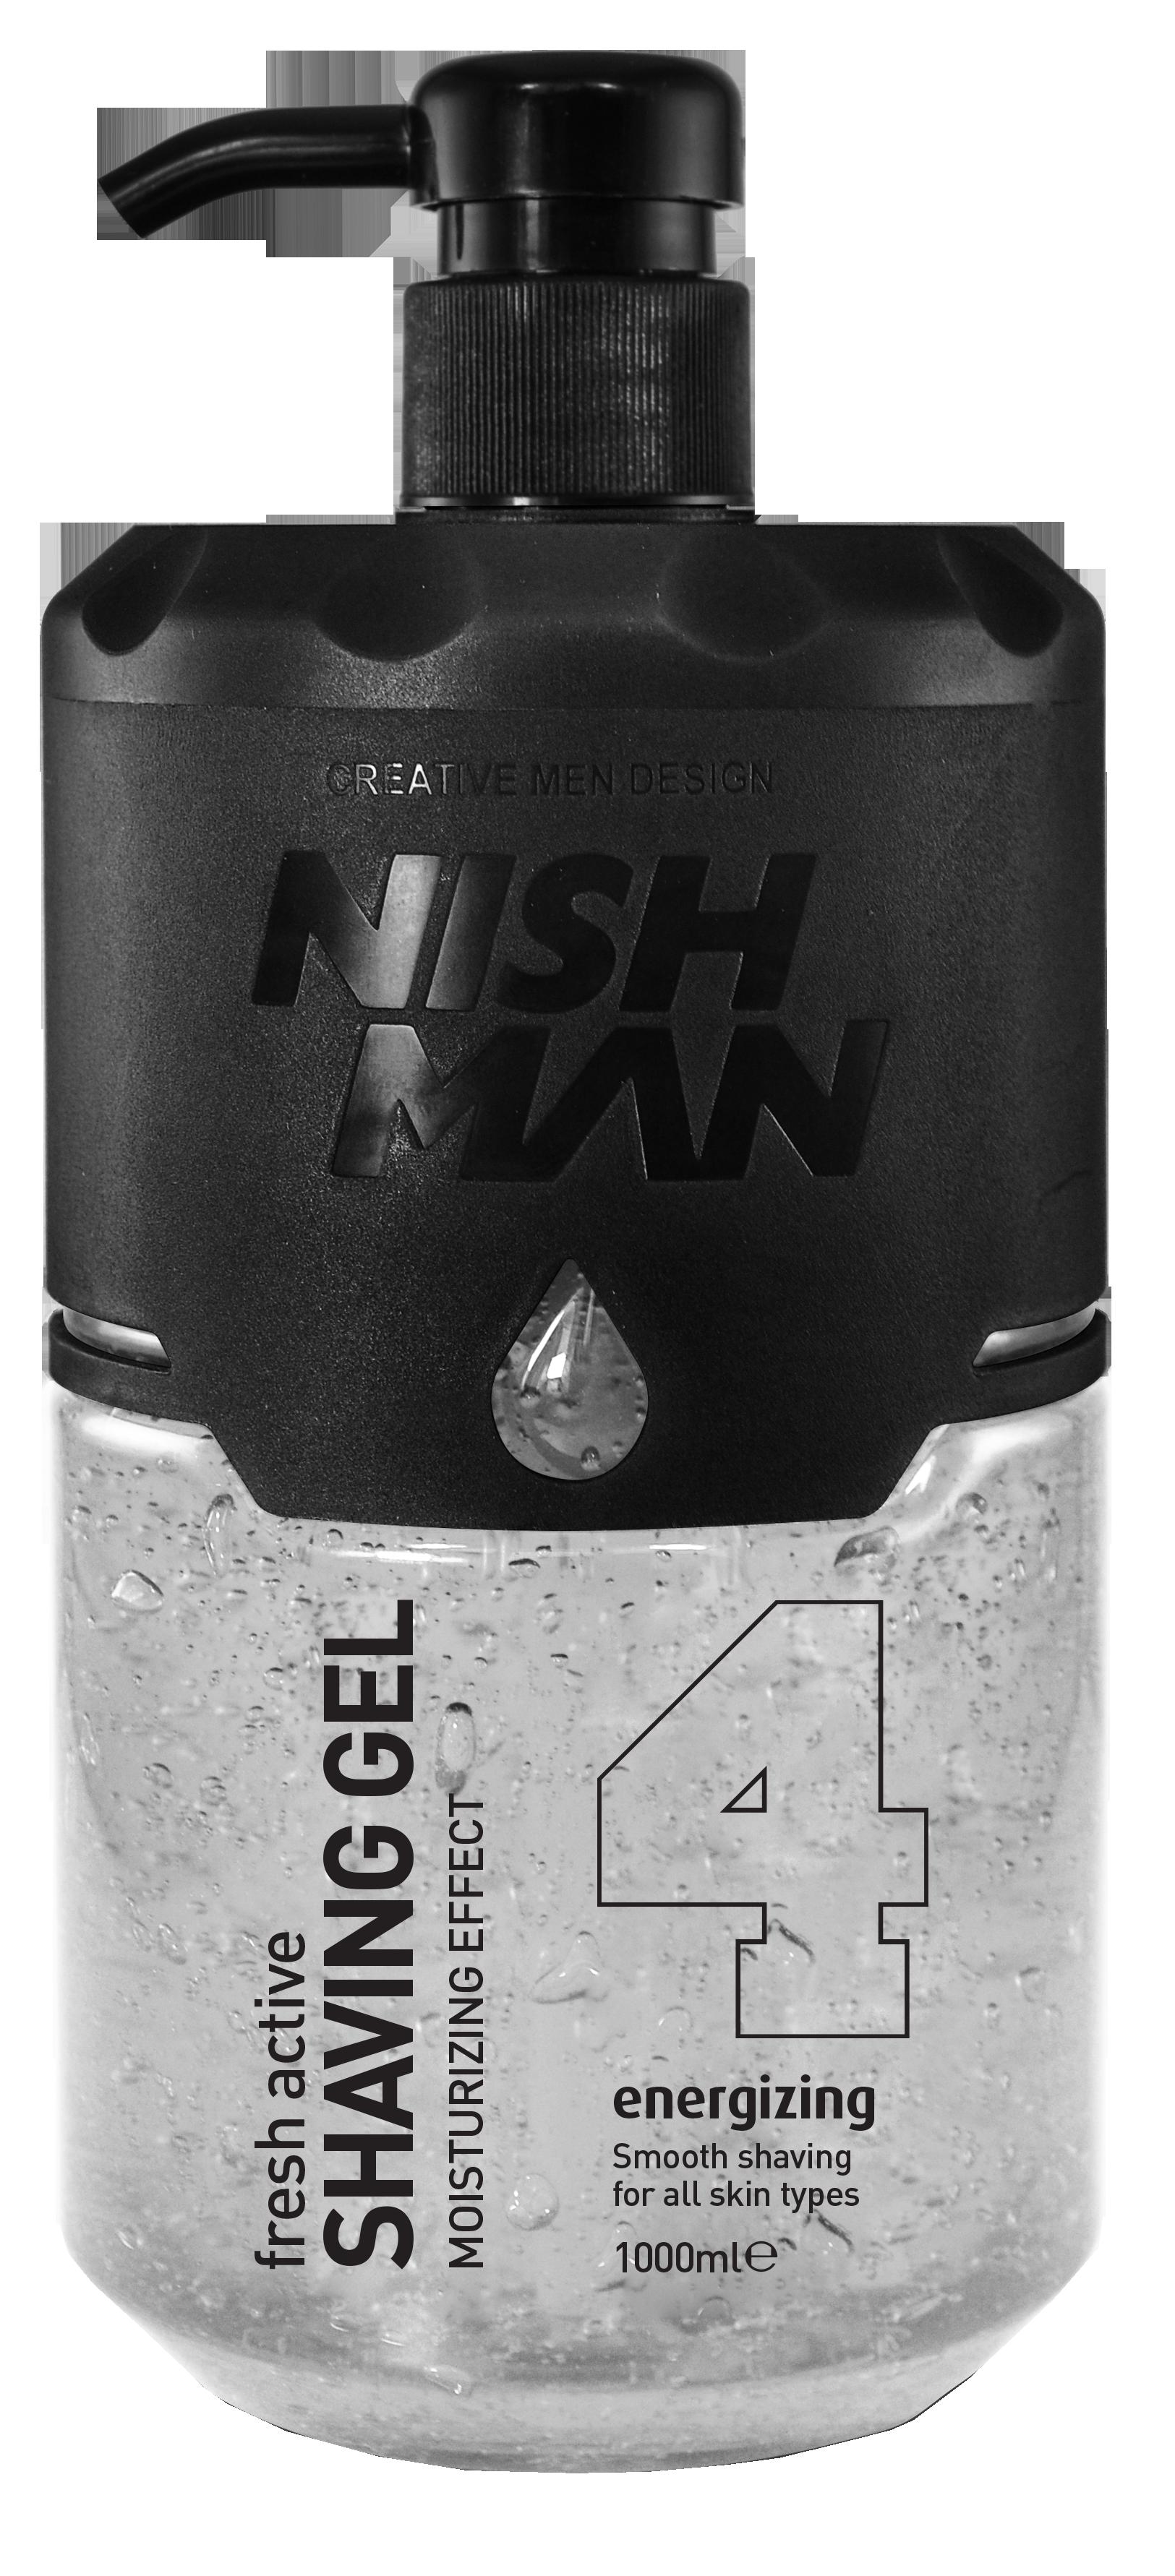 Nishman Shaving Gel 04 - průsvitný gel na holení, 1000 ml